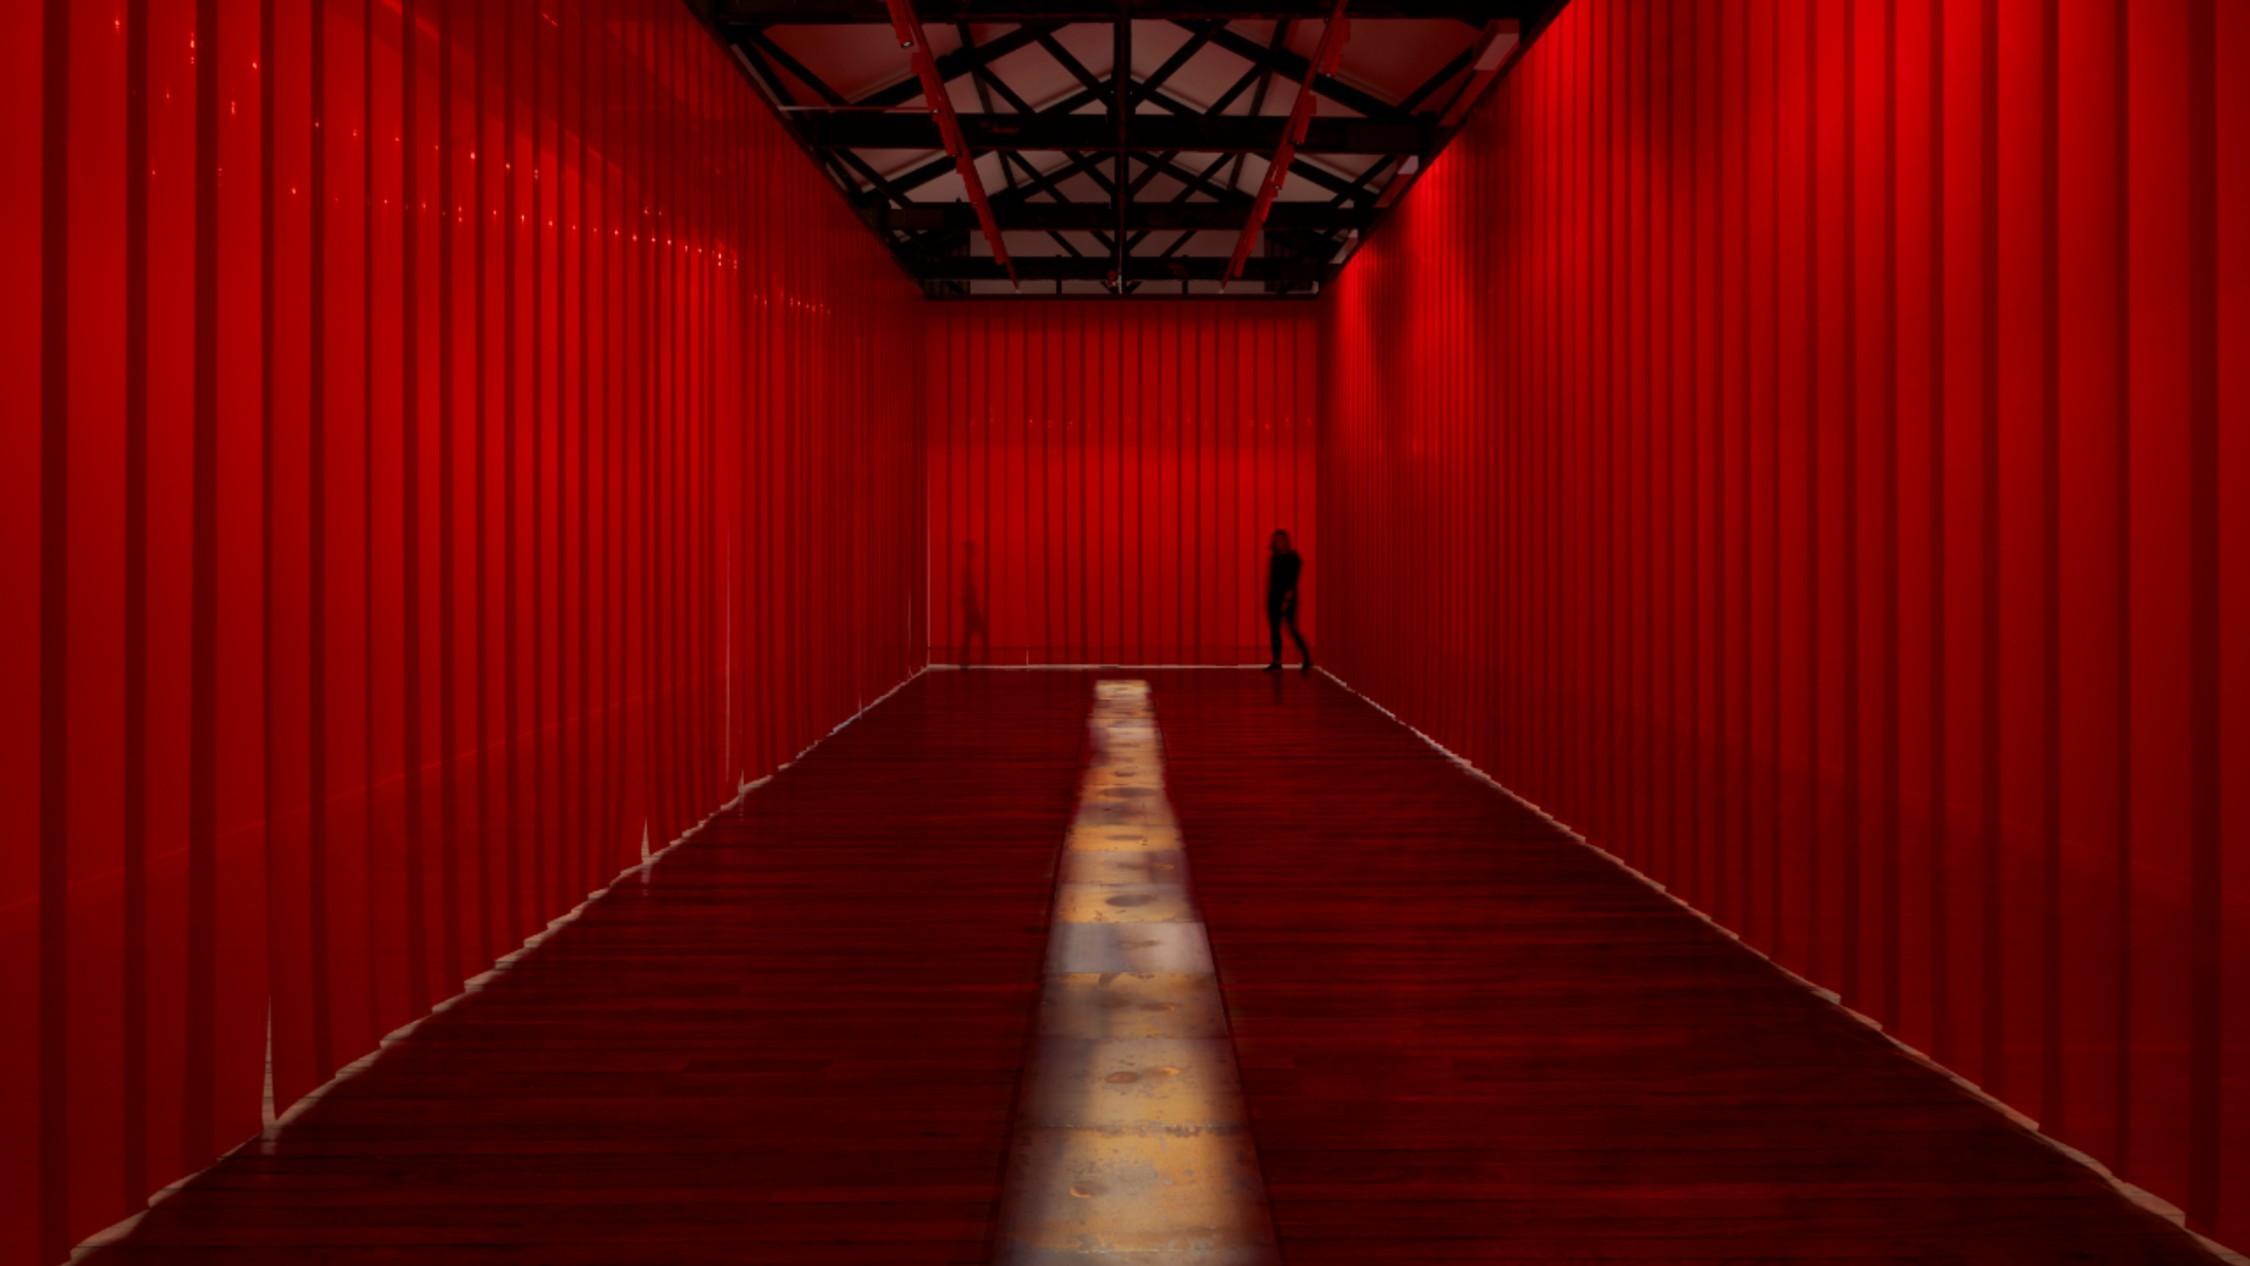 Biennale of Sydney brings stunning art to the city